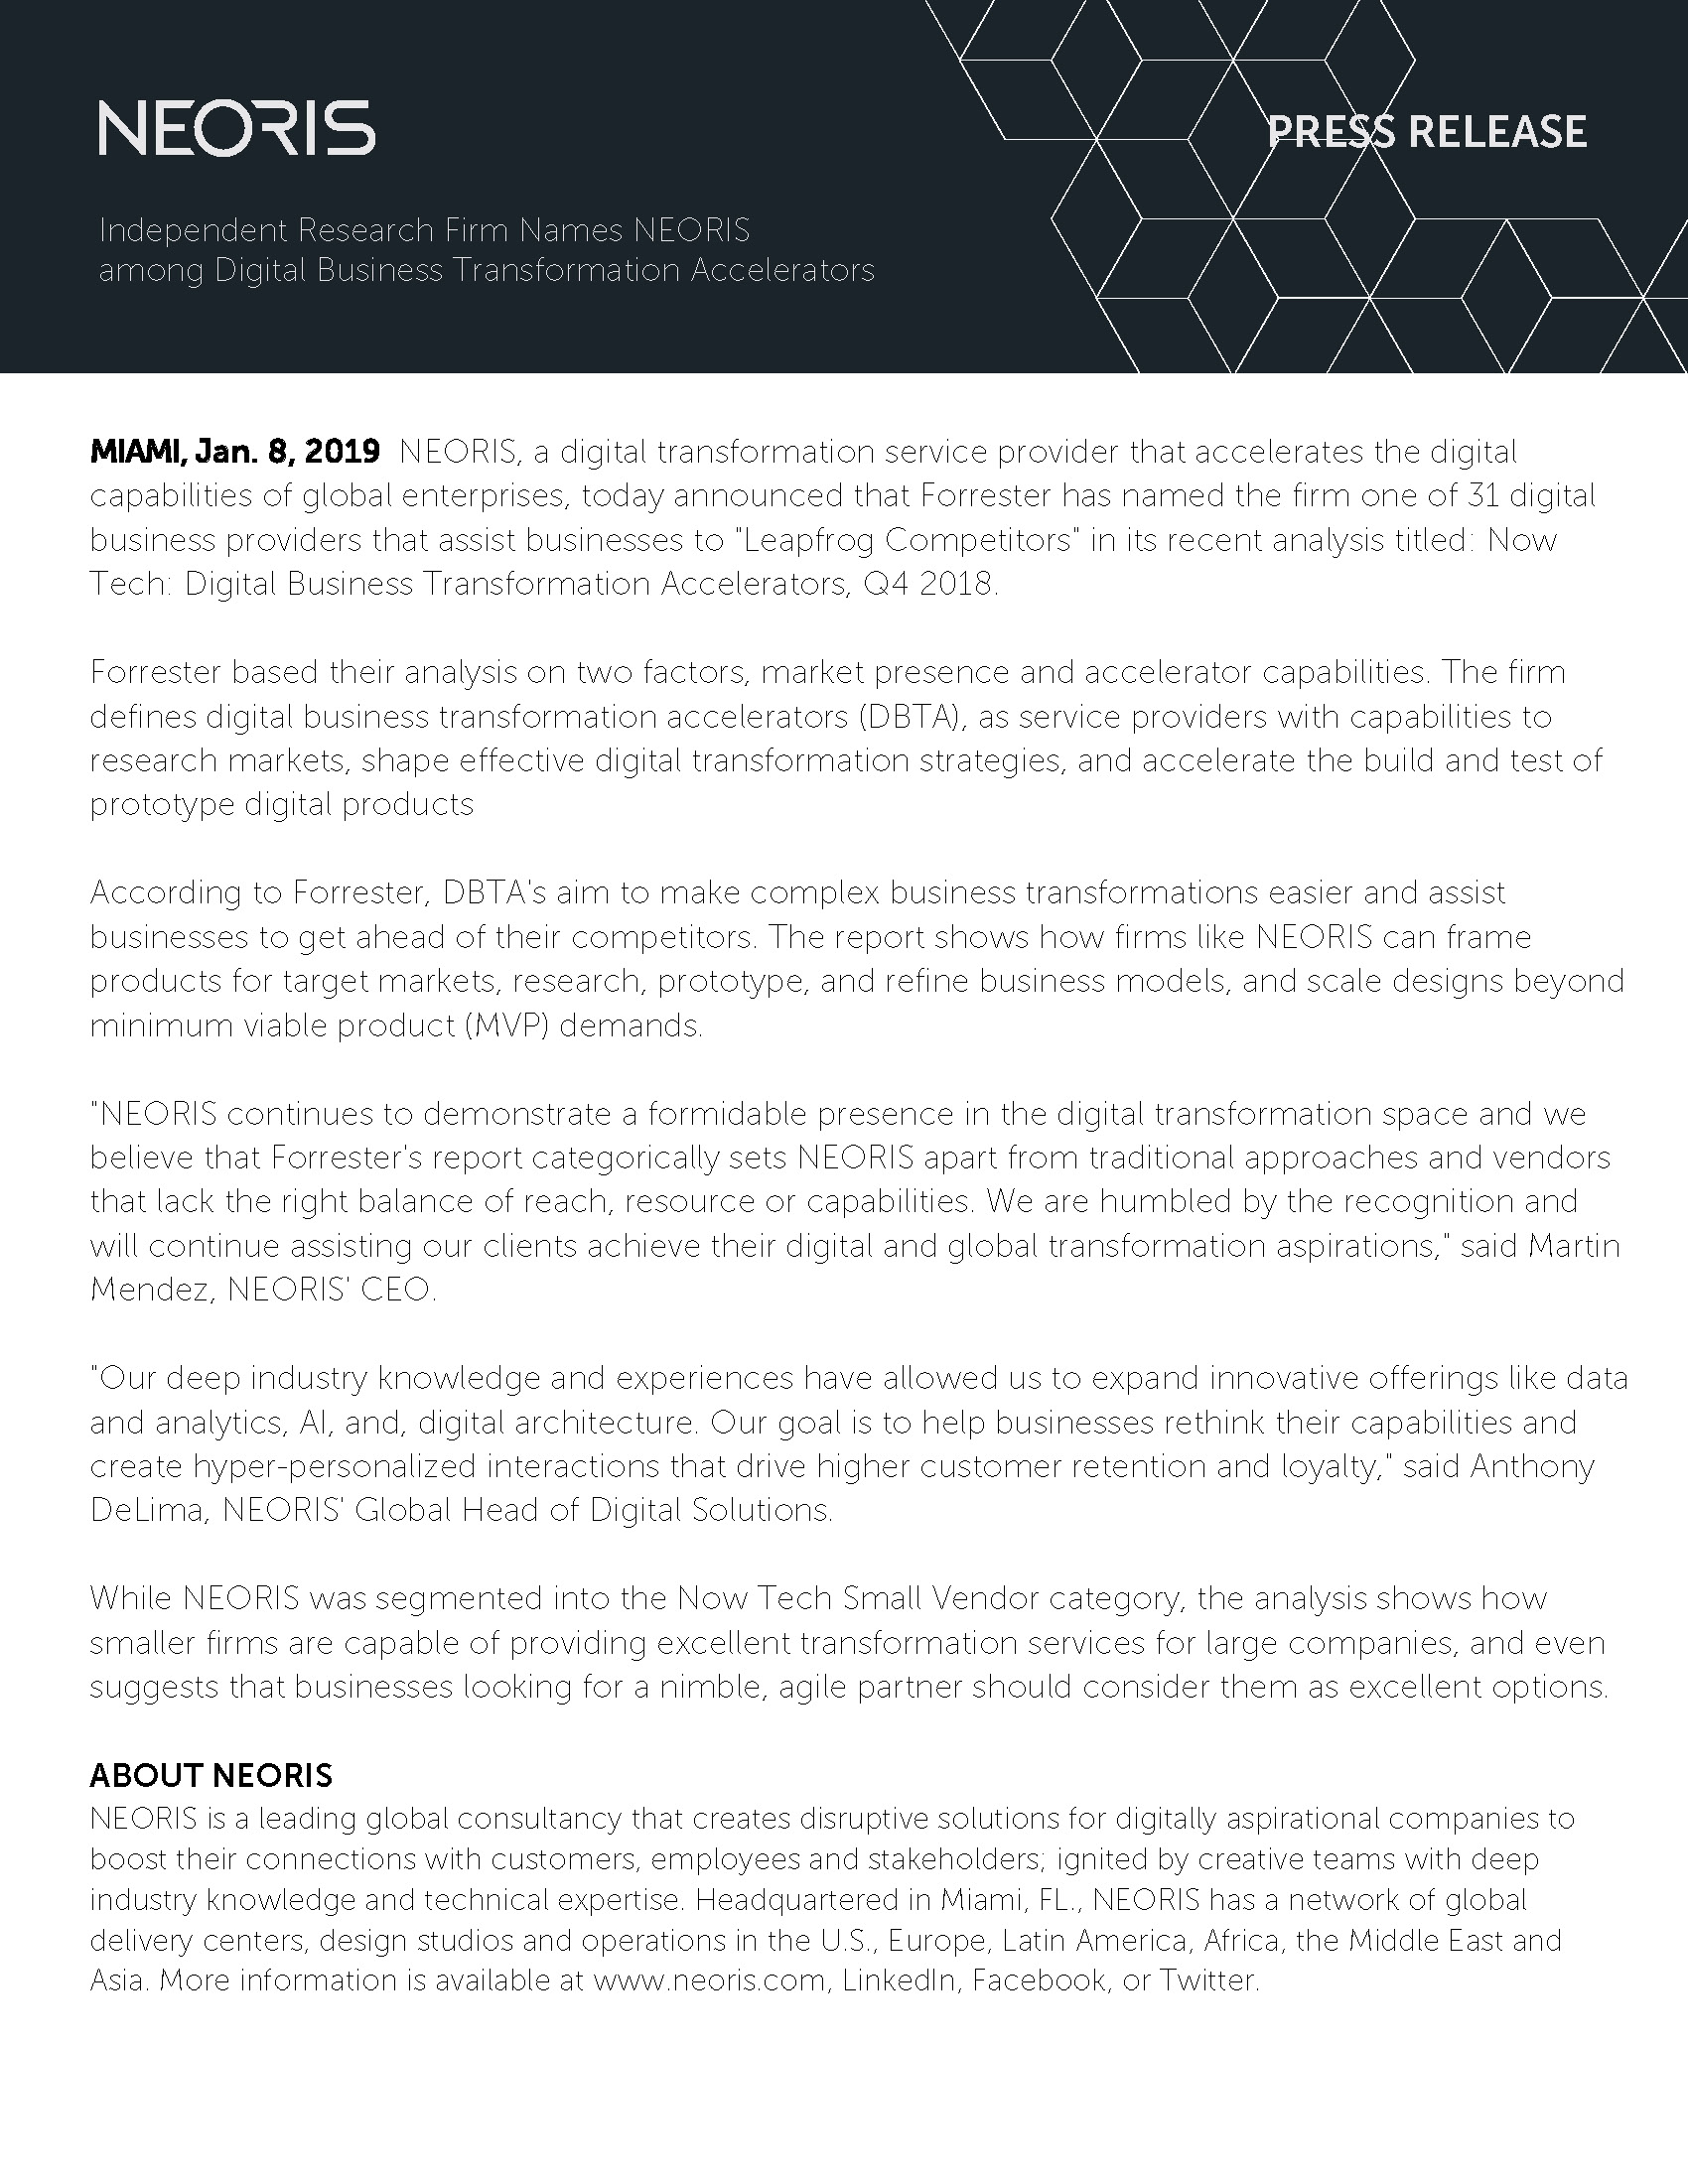 Forrester Annoucement- Now Tech Digital Transformation Accelerator.jpg